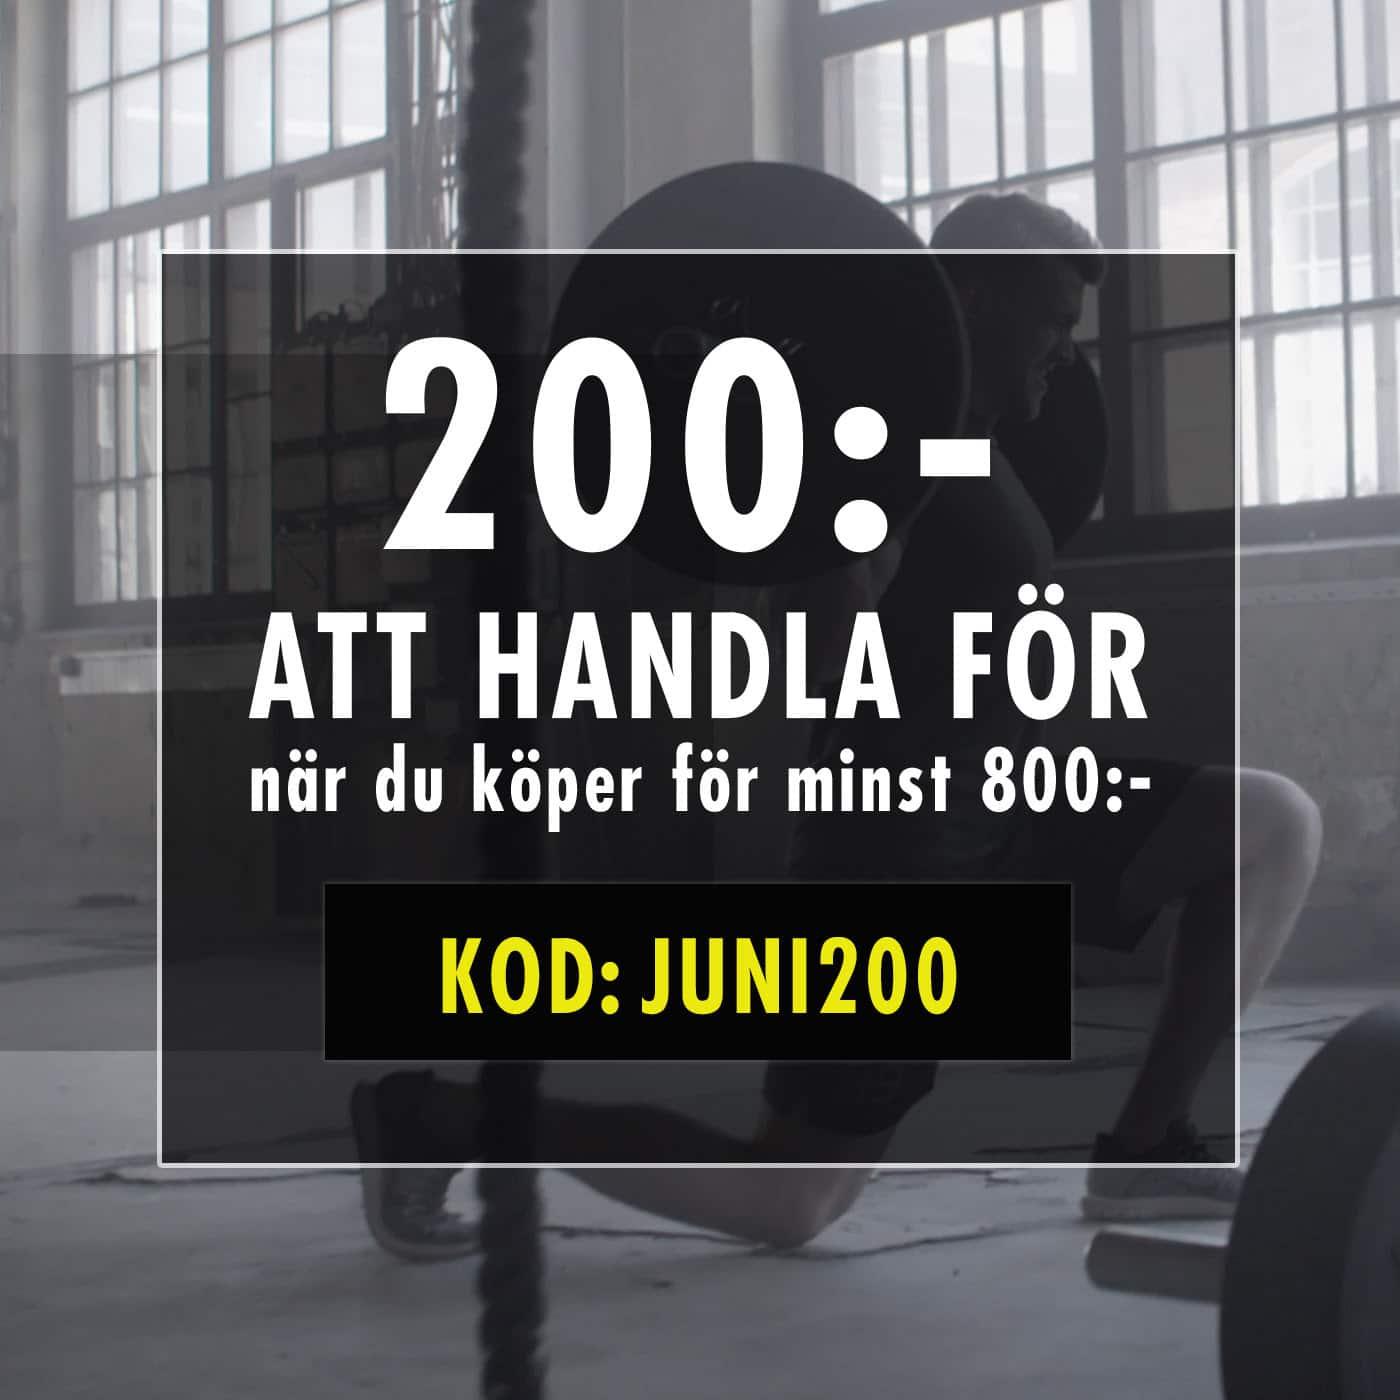 Gymgrossisten 200 kr rabattkod